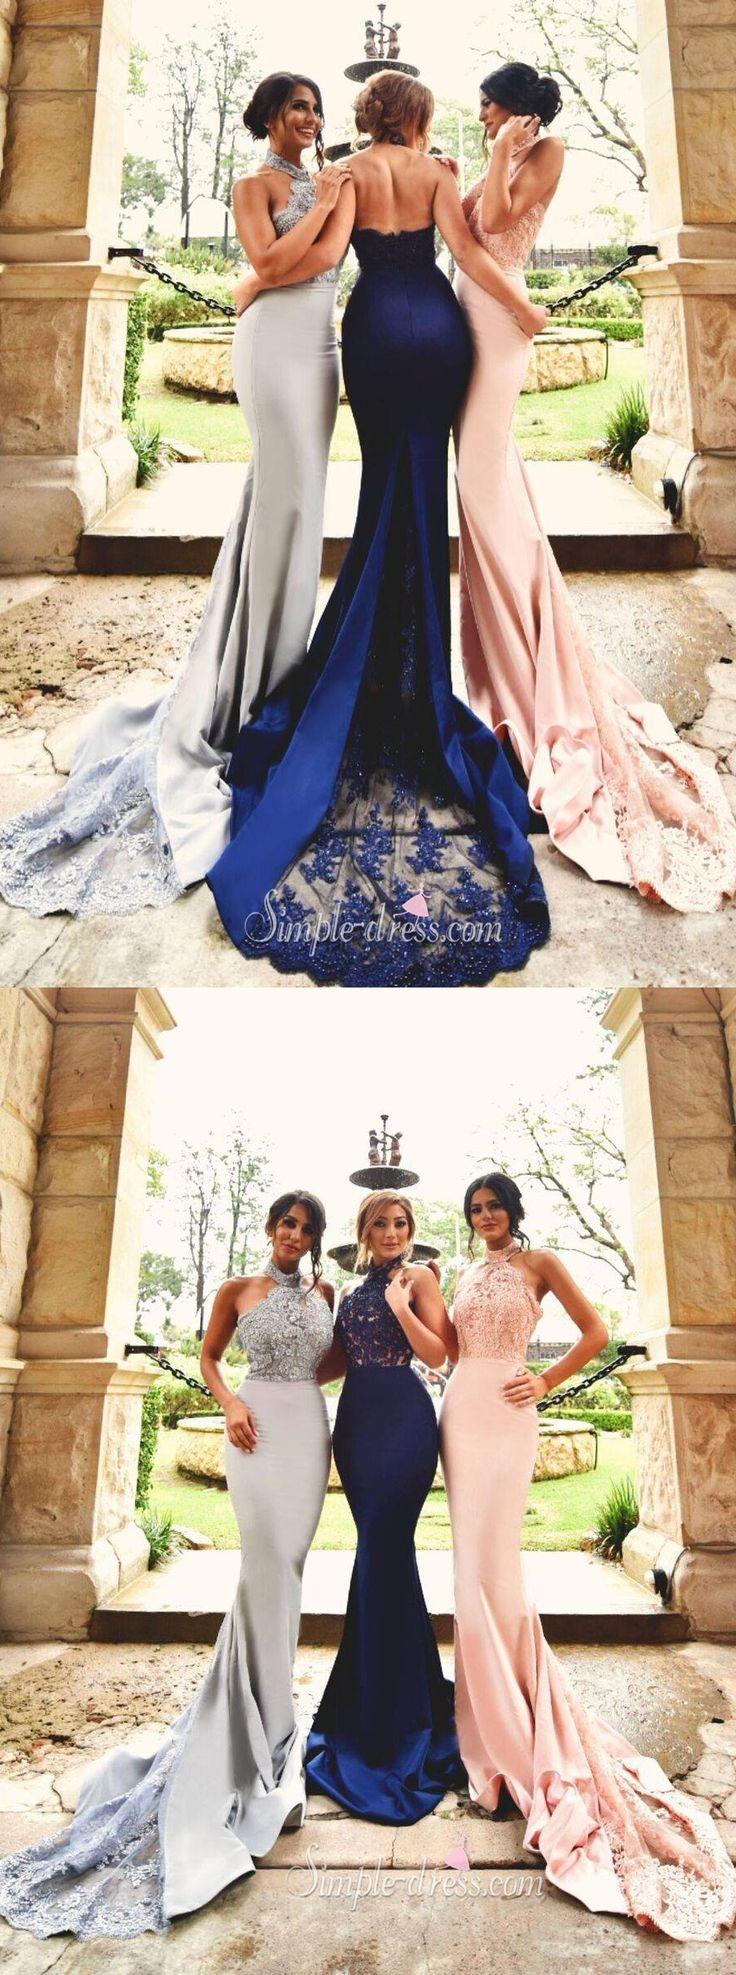 sexy mermaid long prom dress 2016, bridesmaid dress, pink prom dress, navy prom dress, wedding party dress